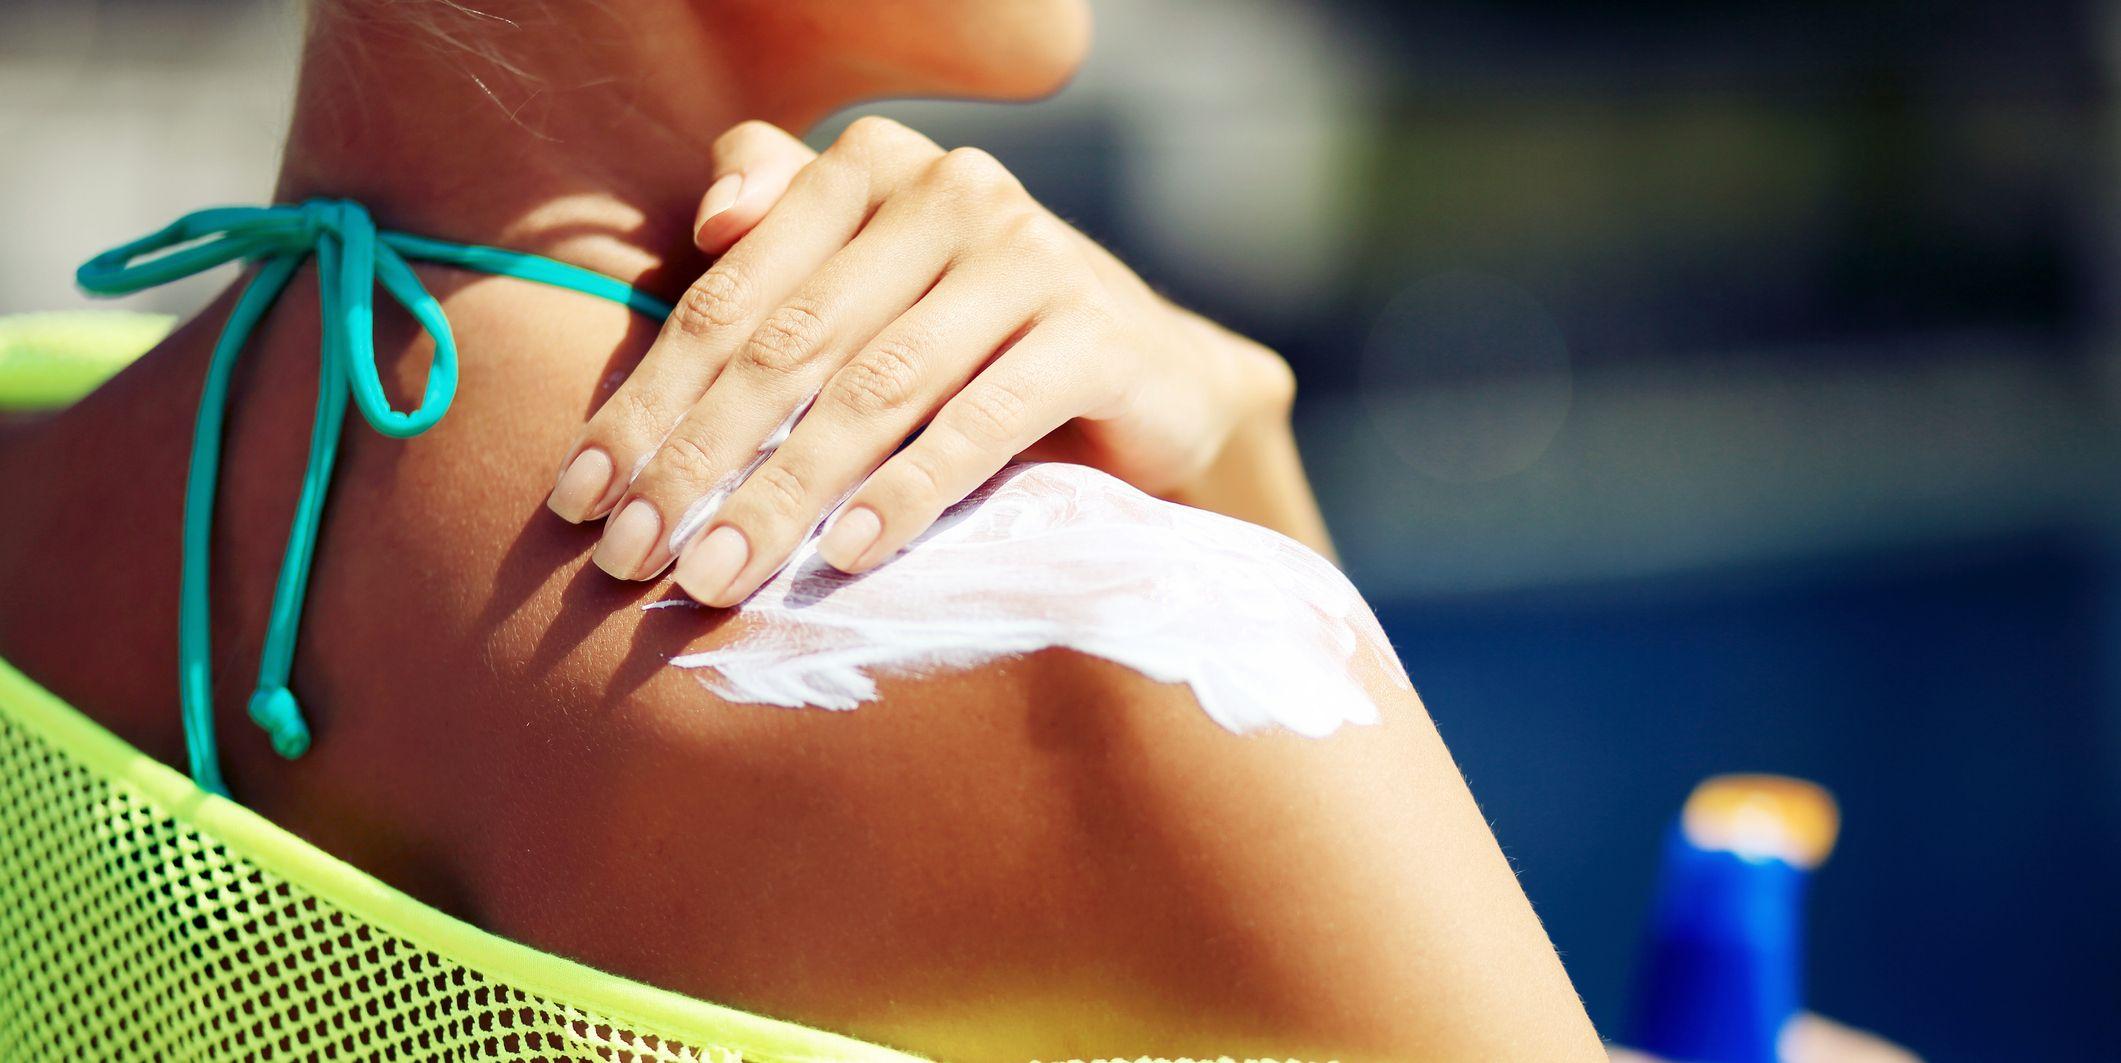 Woman applying sunblock protection on shoulders